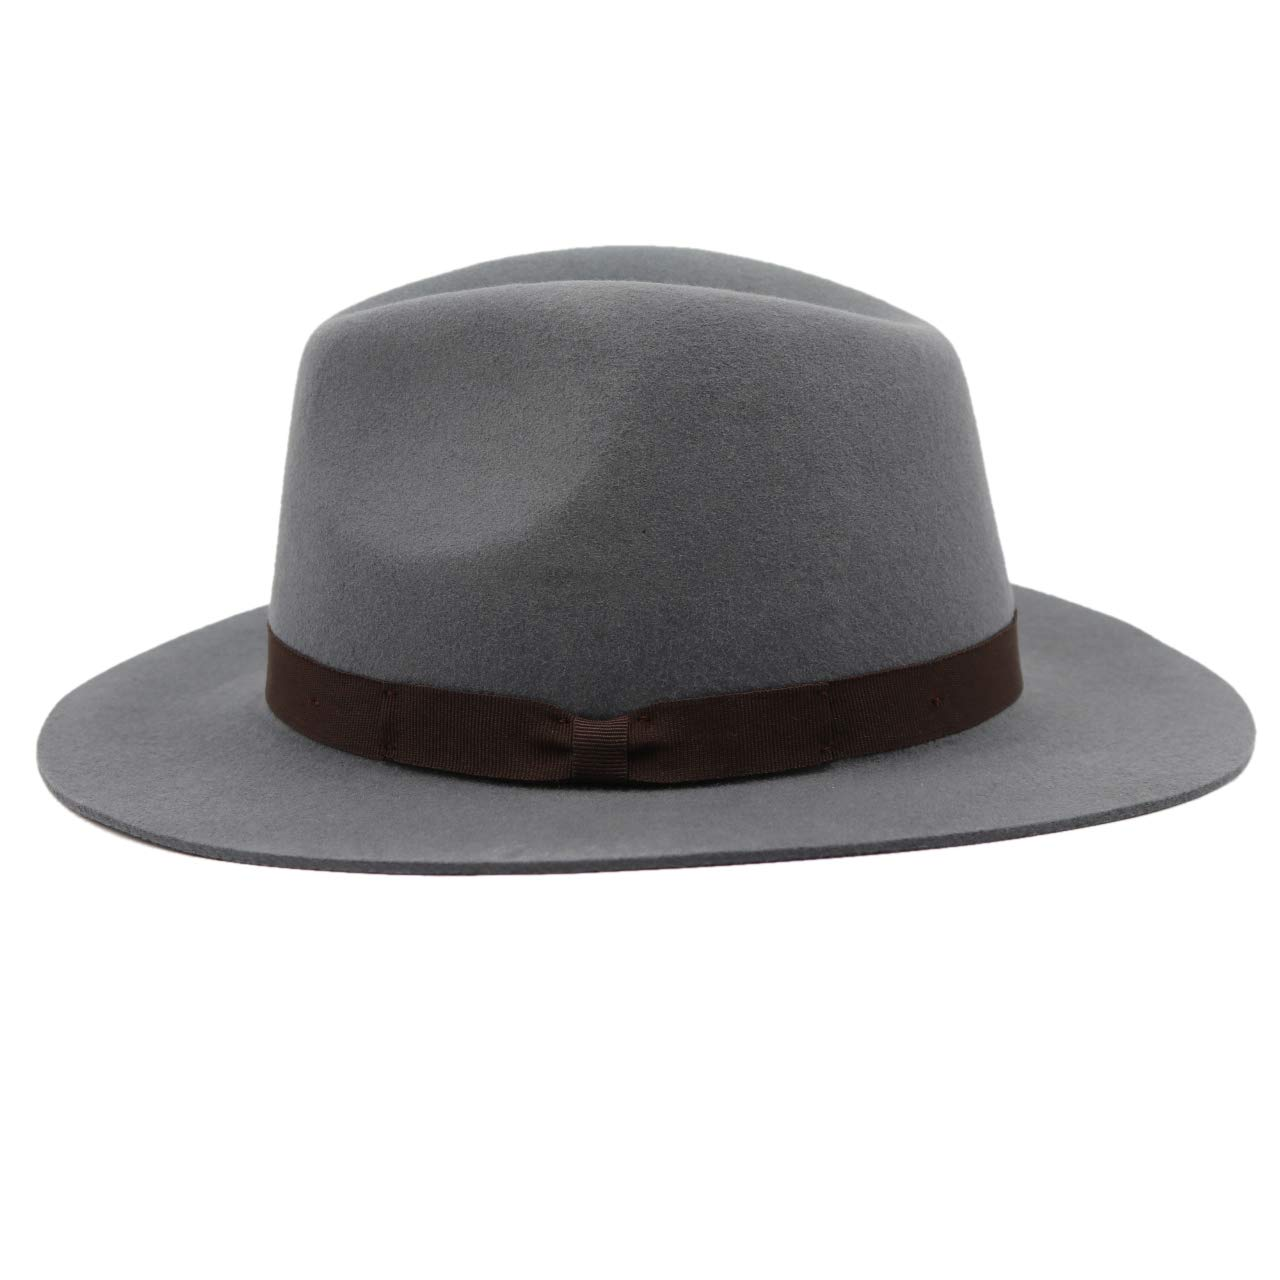 Stageya Capone Alpas 100/% Wool Felt Unisex Modern-Day Fedora Hat for Women /& Men